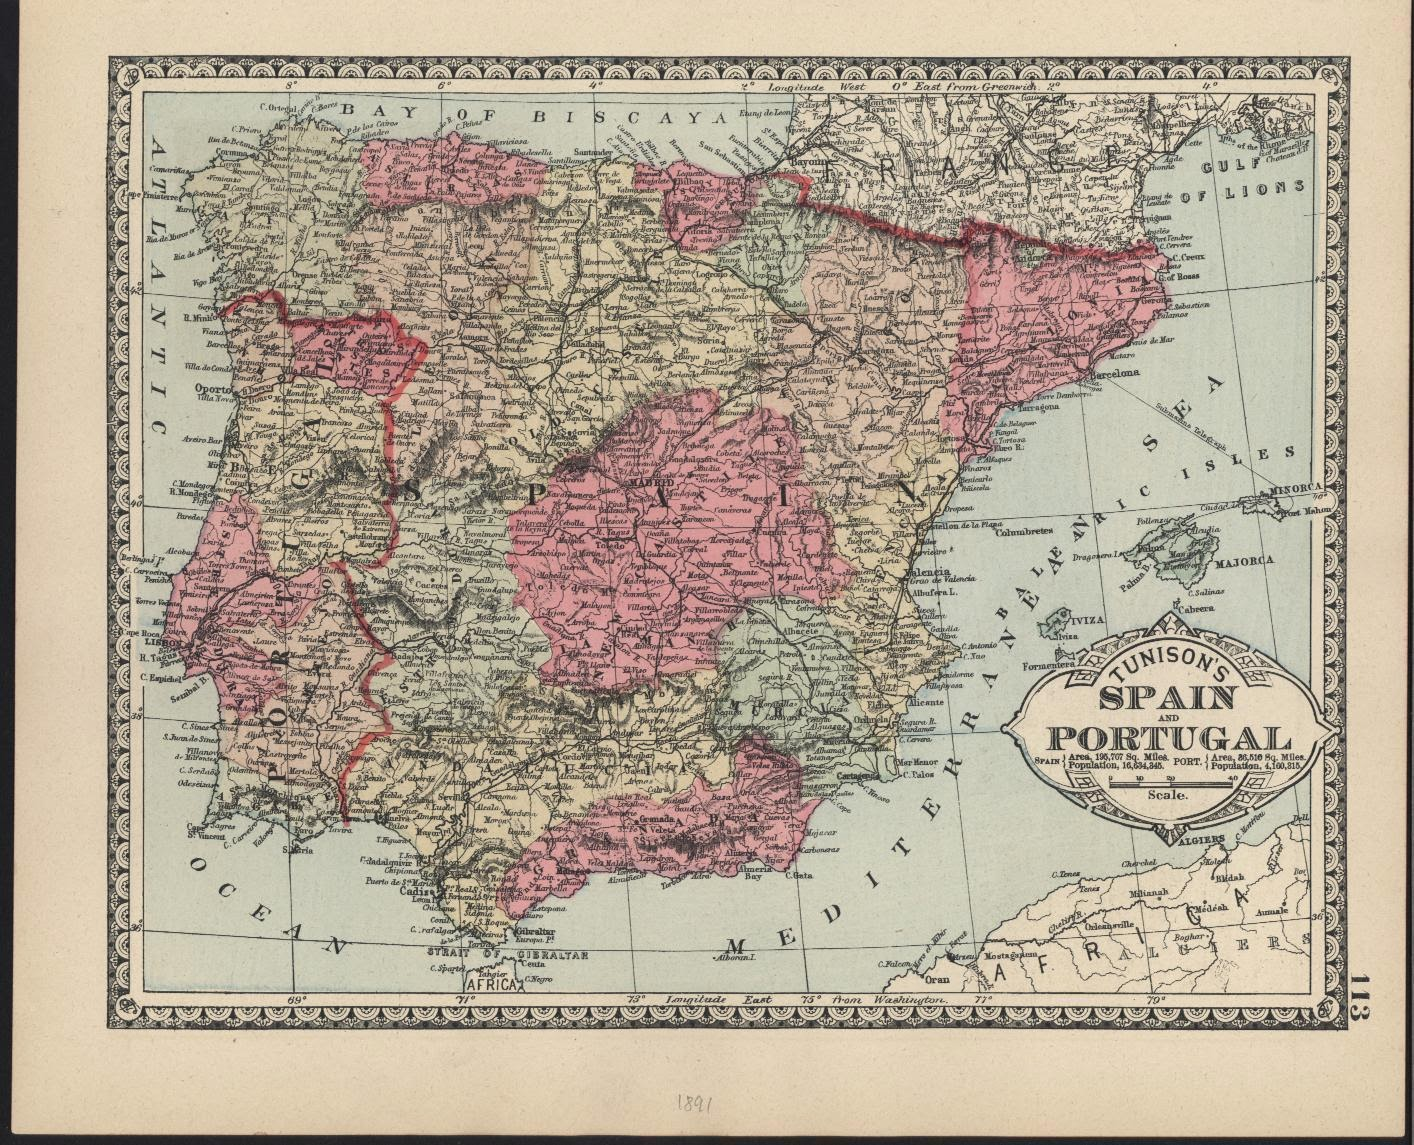 España y Portugal 1891 Henry Tunison